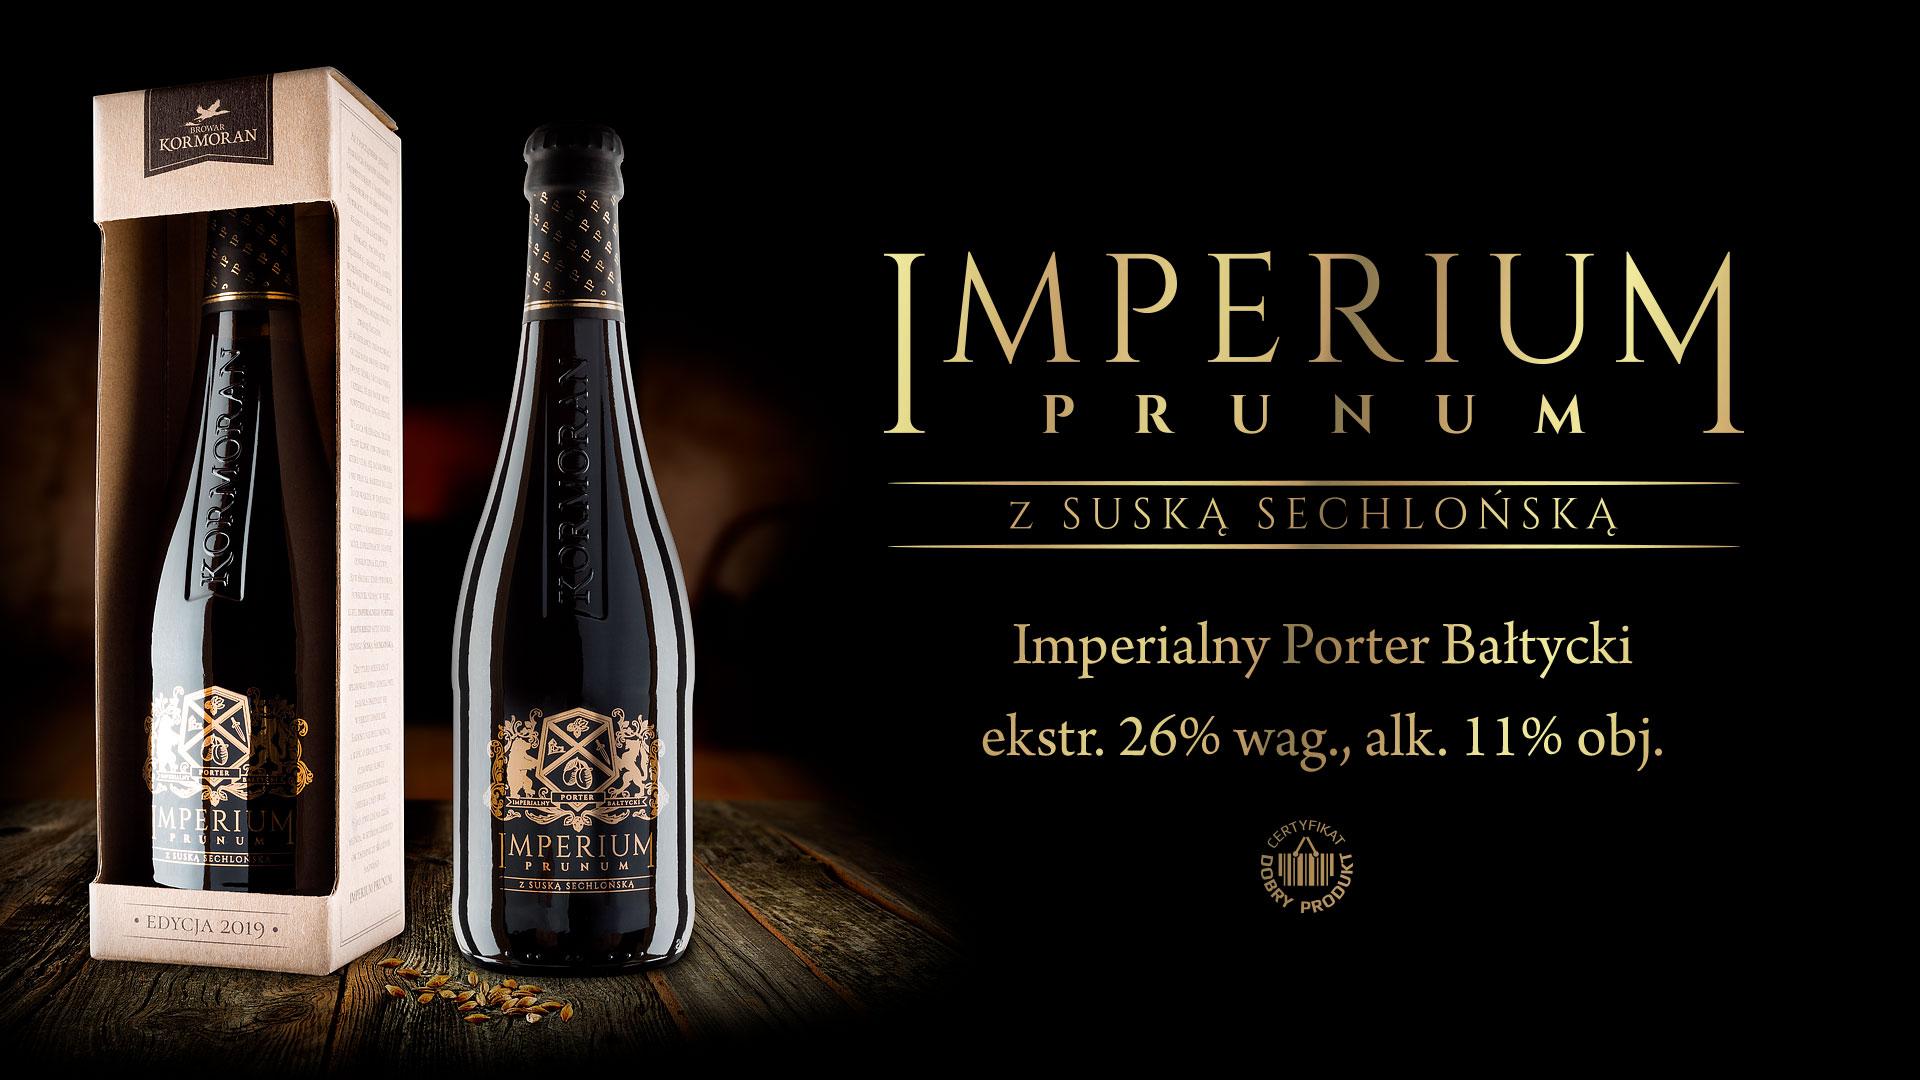 Piwo Imperium Prunum 2019 - Browar Kormoran